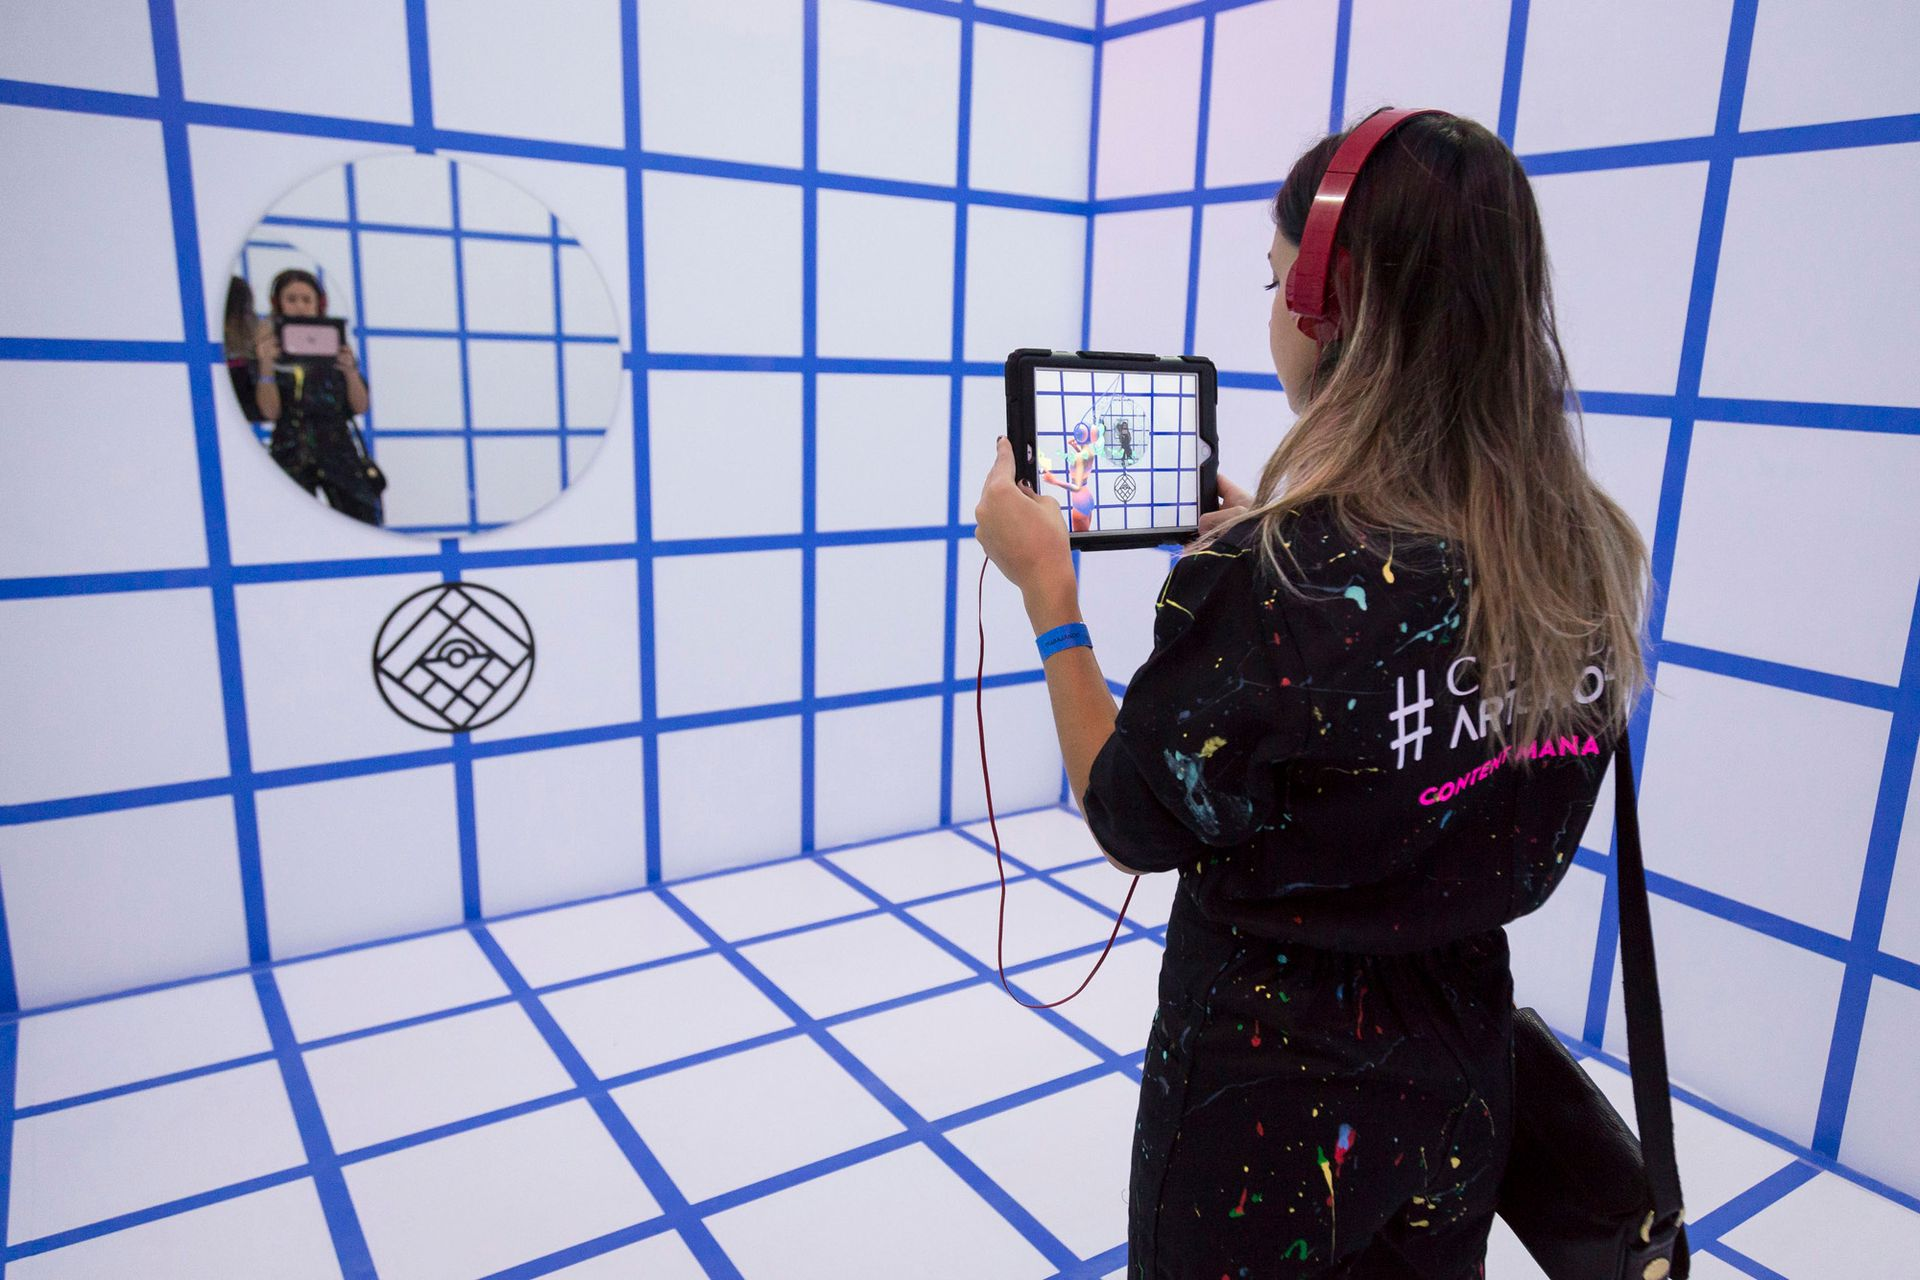 No falta realidad virtual